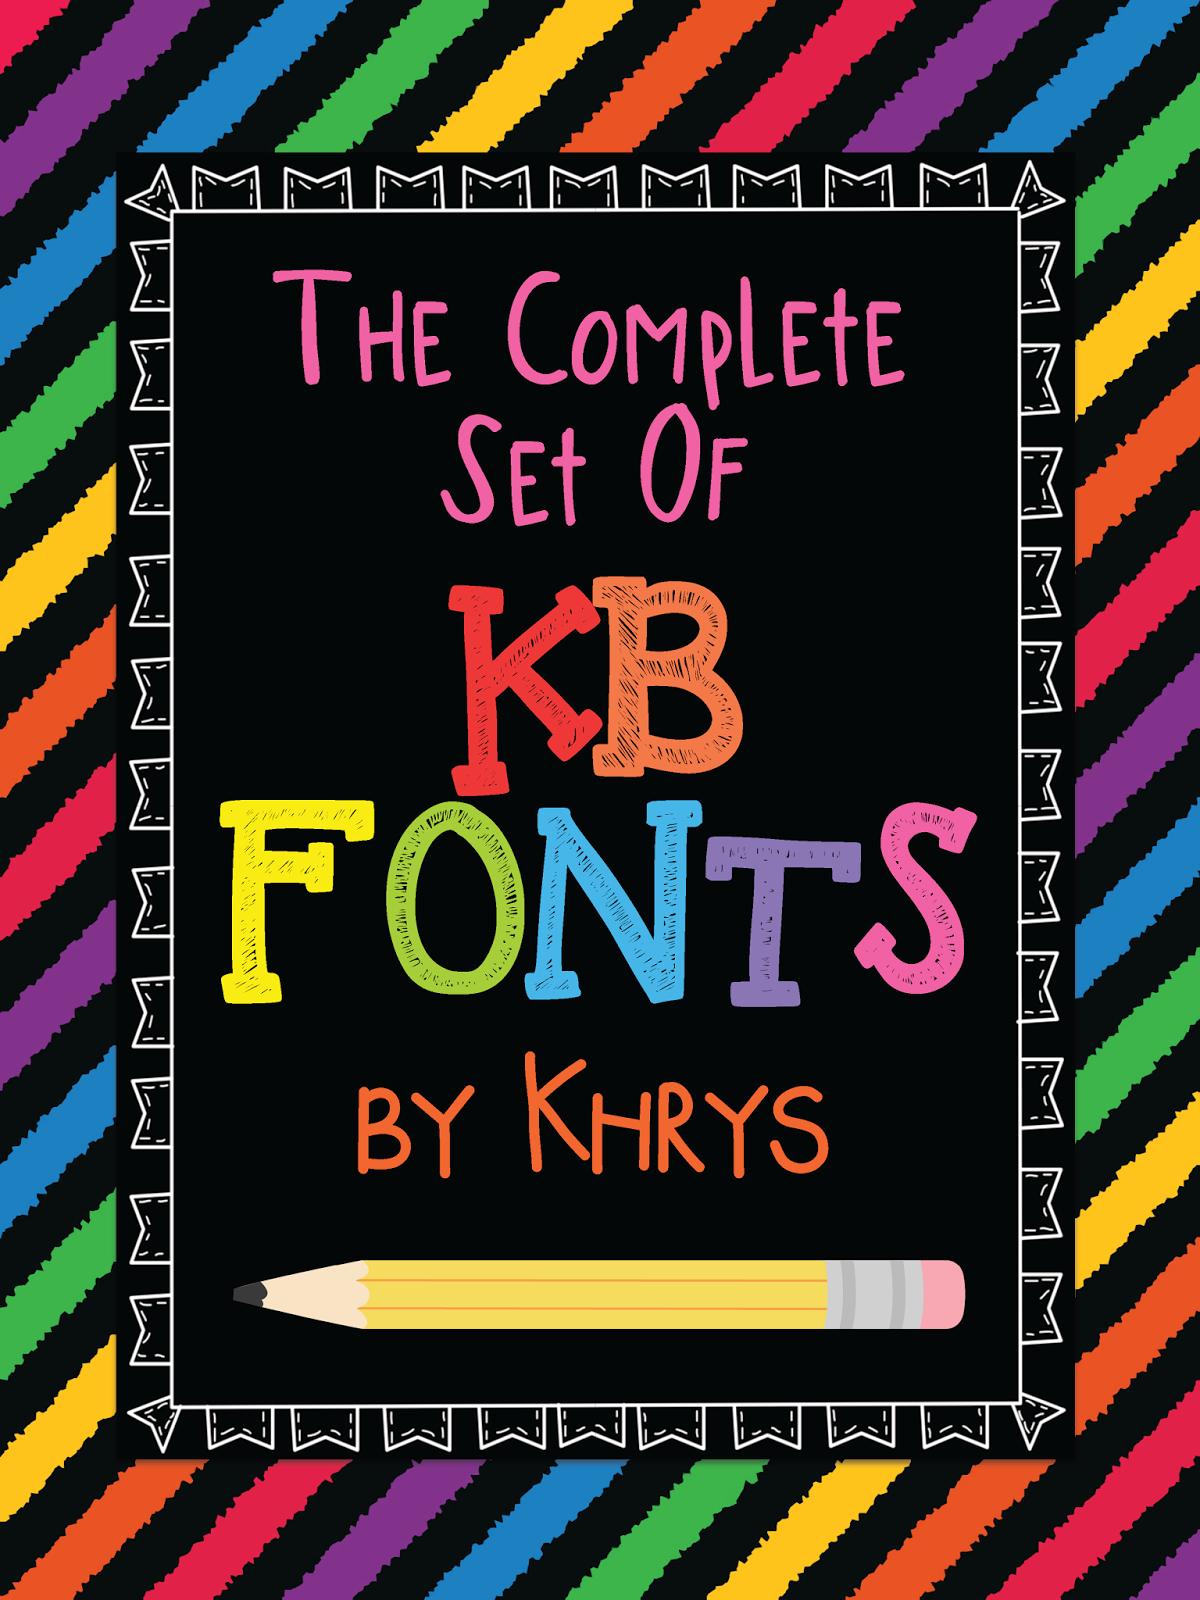 Download Font Frenzy - Big Font Giveaway! | Font packs, Funky fonts ...